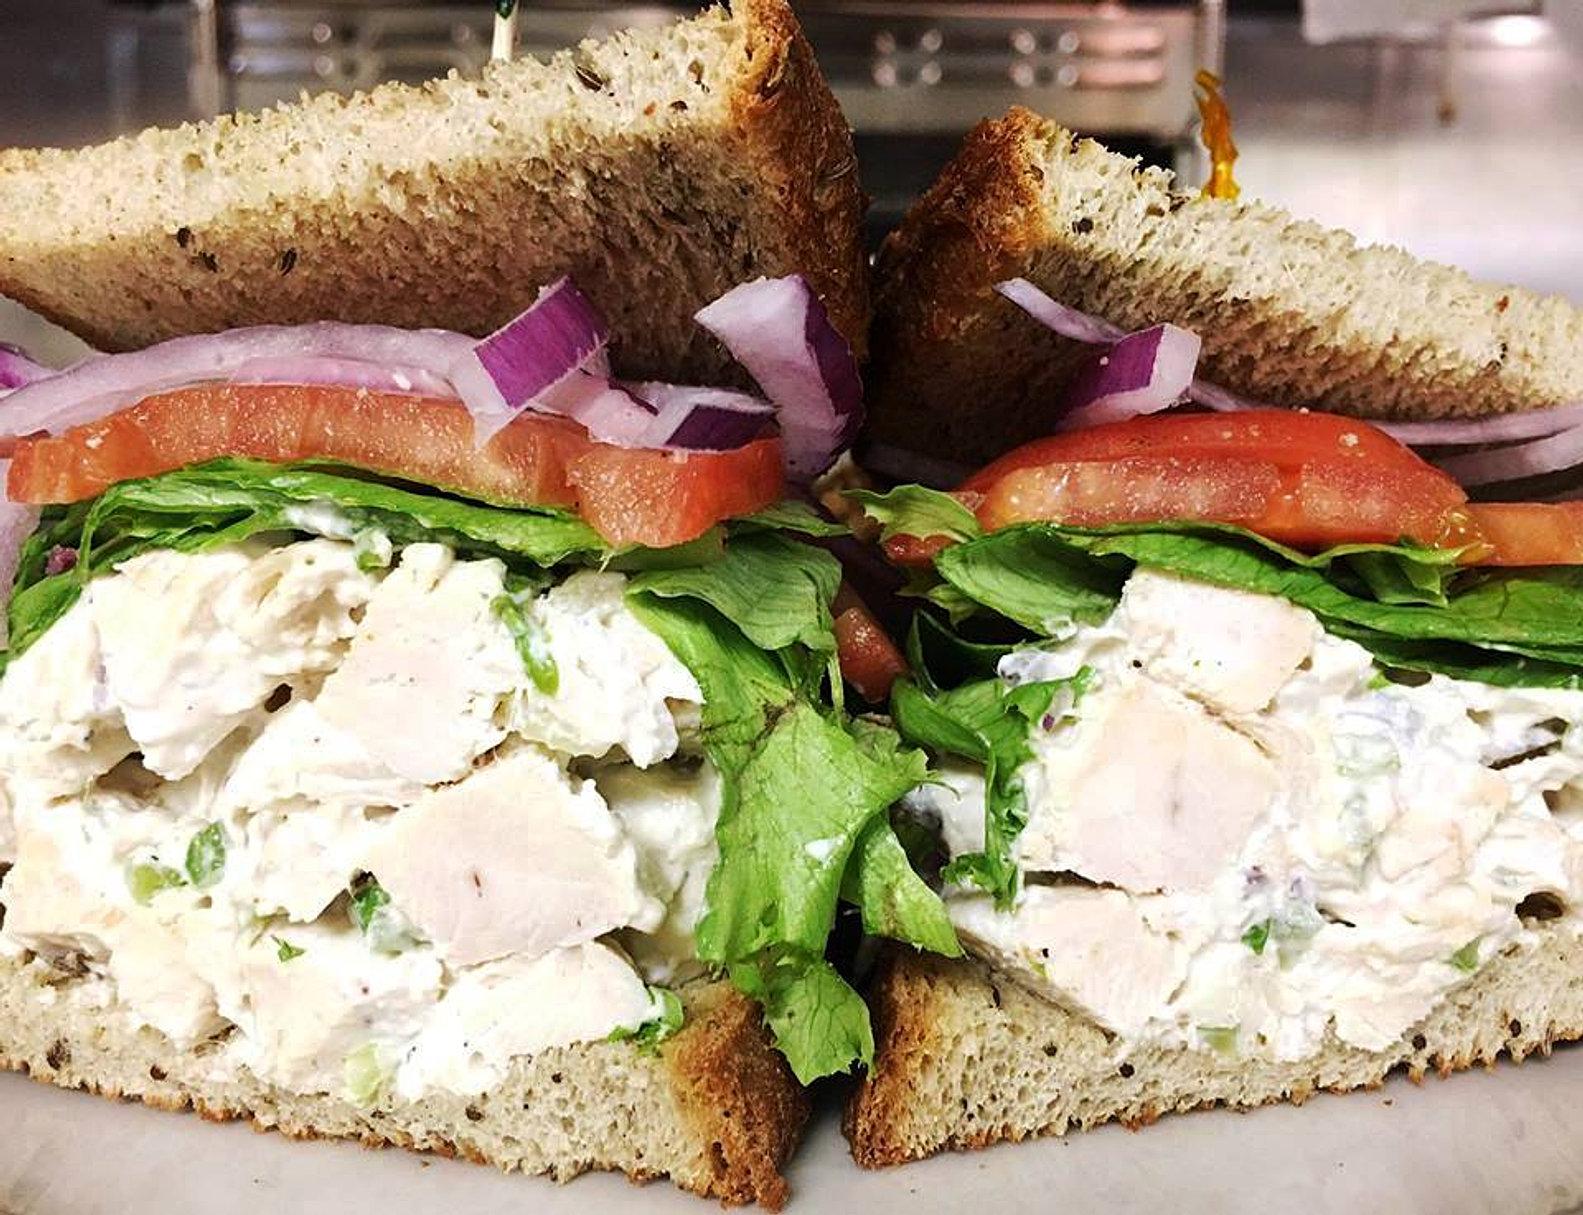 sols sandwiches gulf gate sarasota & SOLu0027S NYC DELI | NEW YORK DELI | JEWISH DELI | GULF GATE | SARASOTA